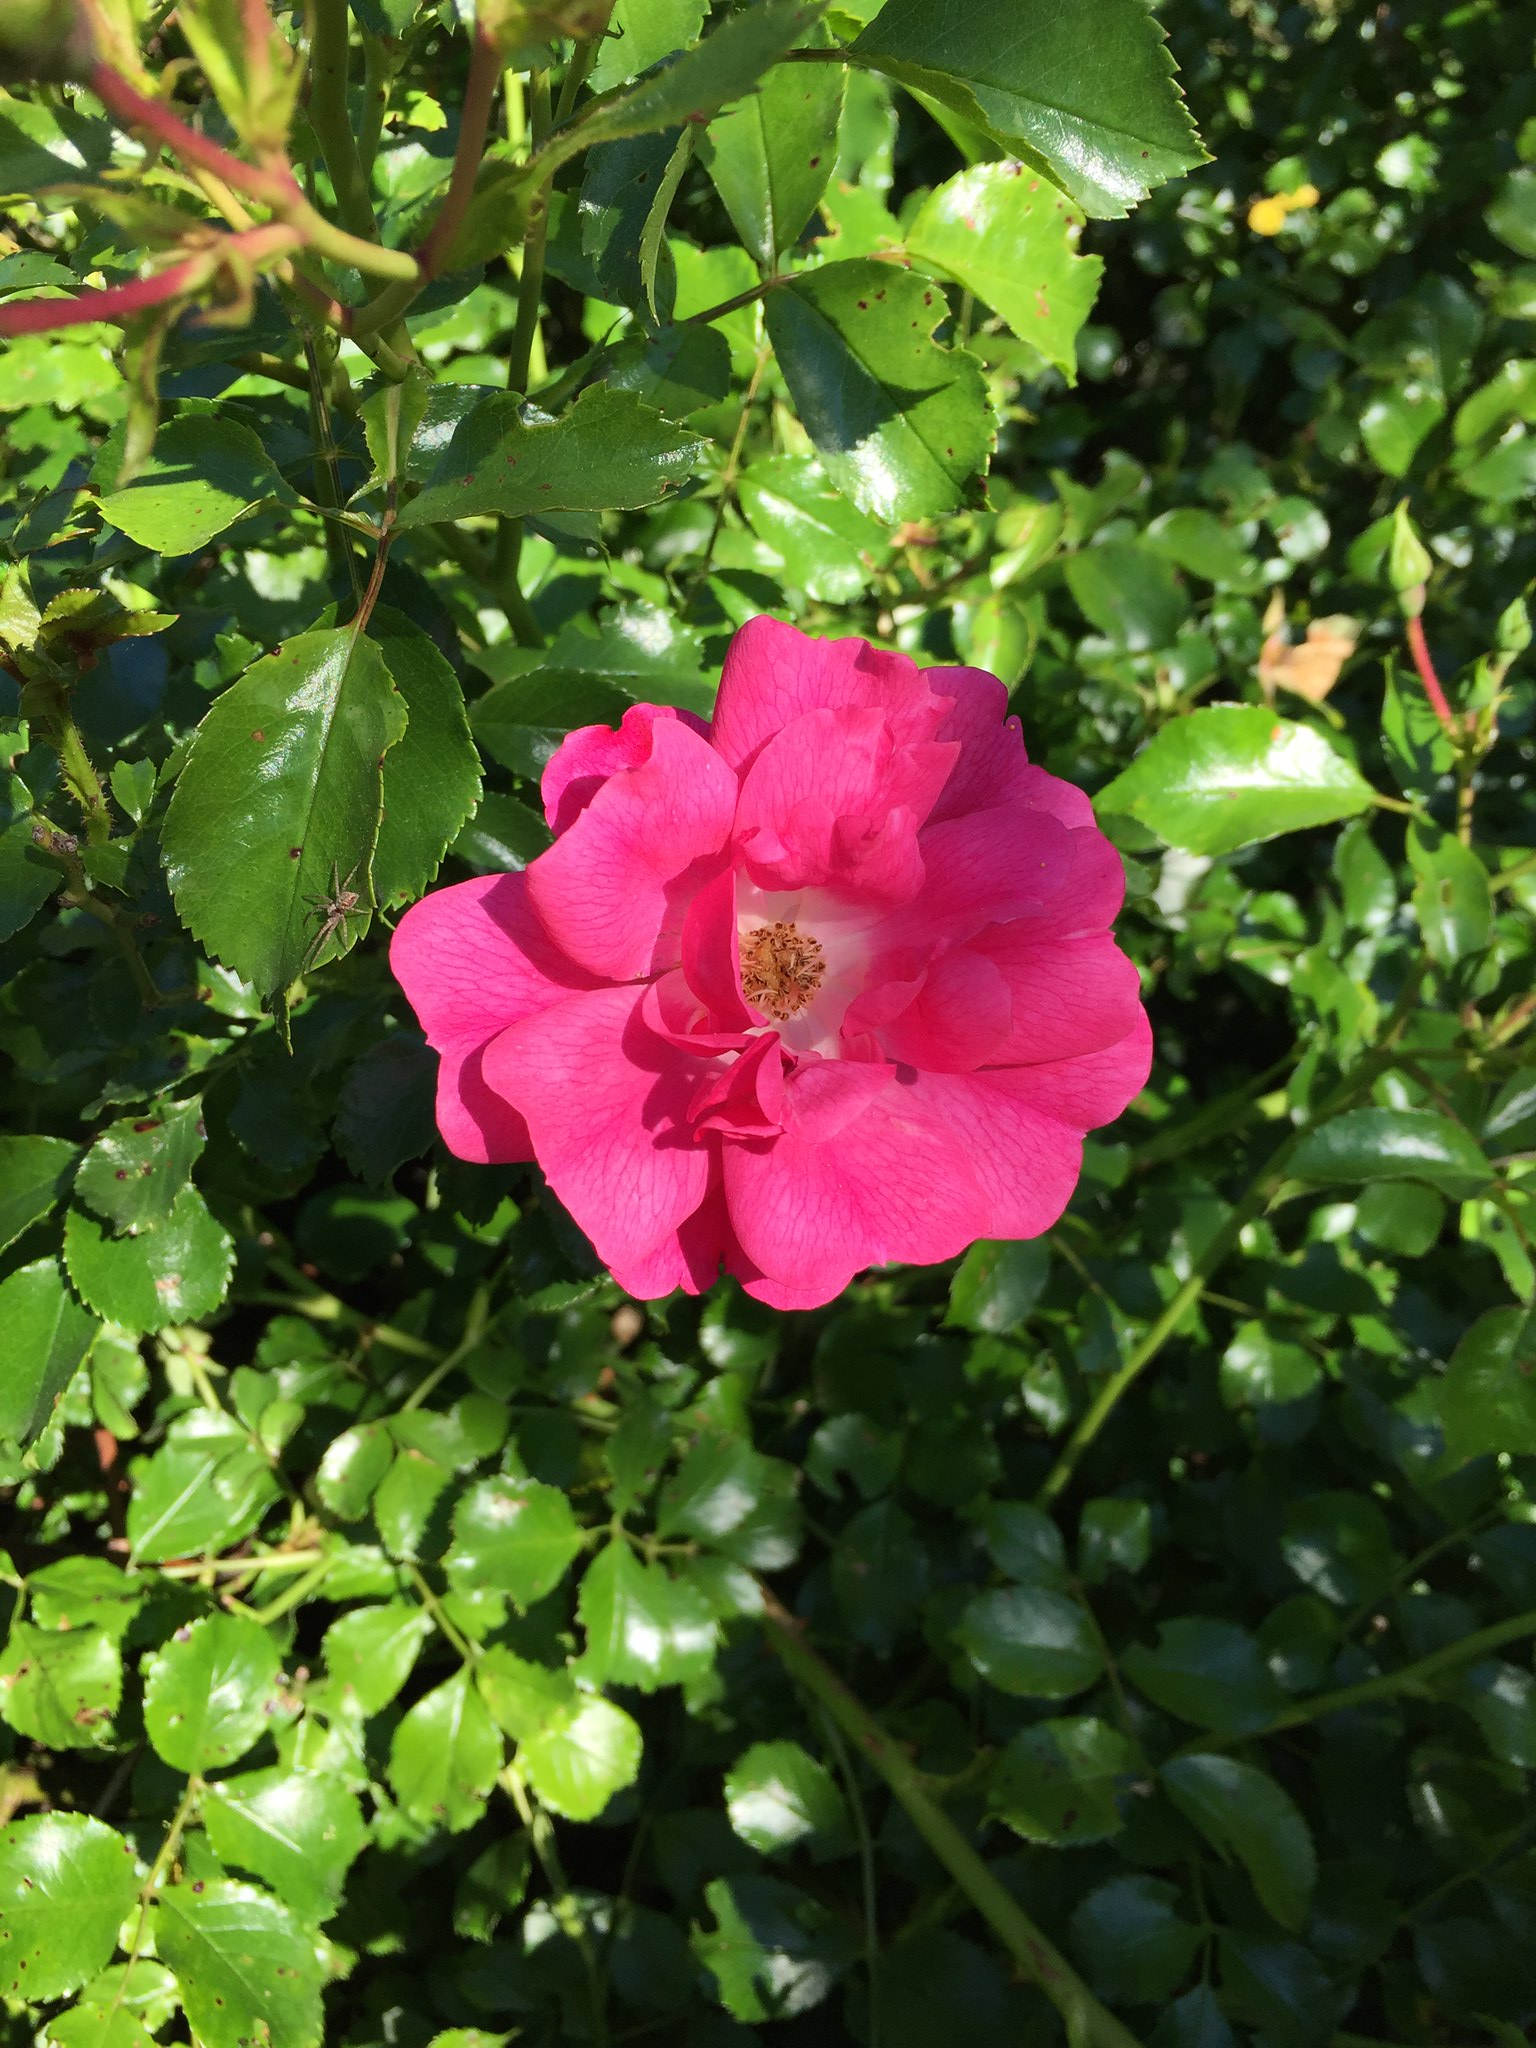 Rose - Marie Catherine Phanekham